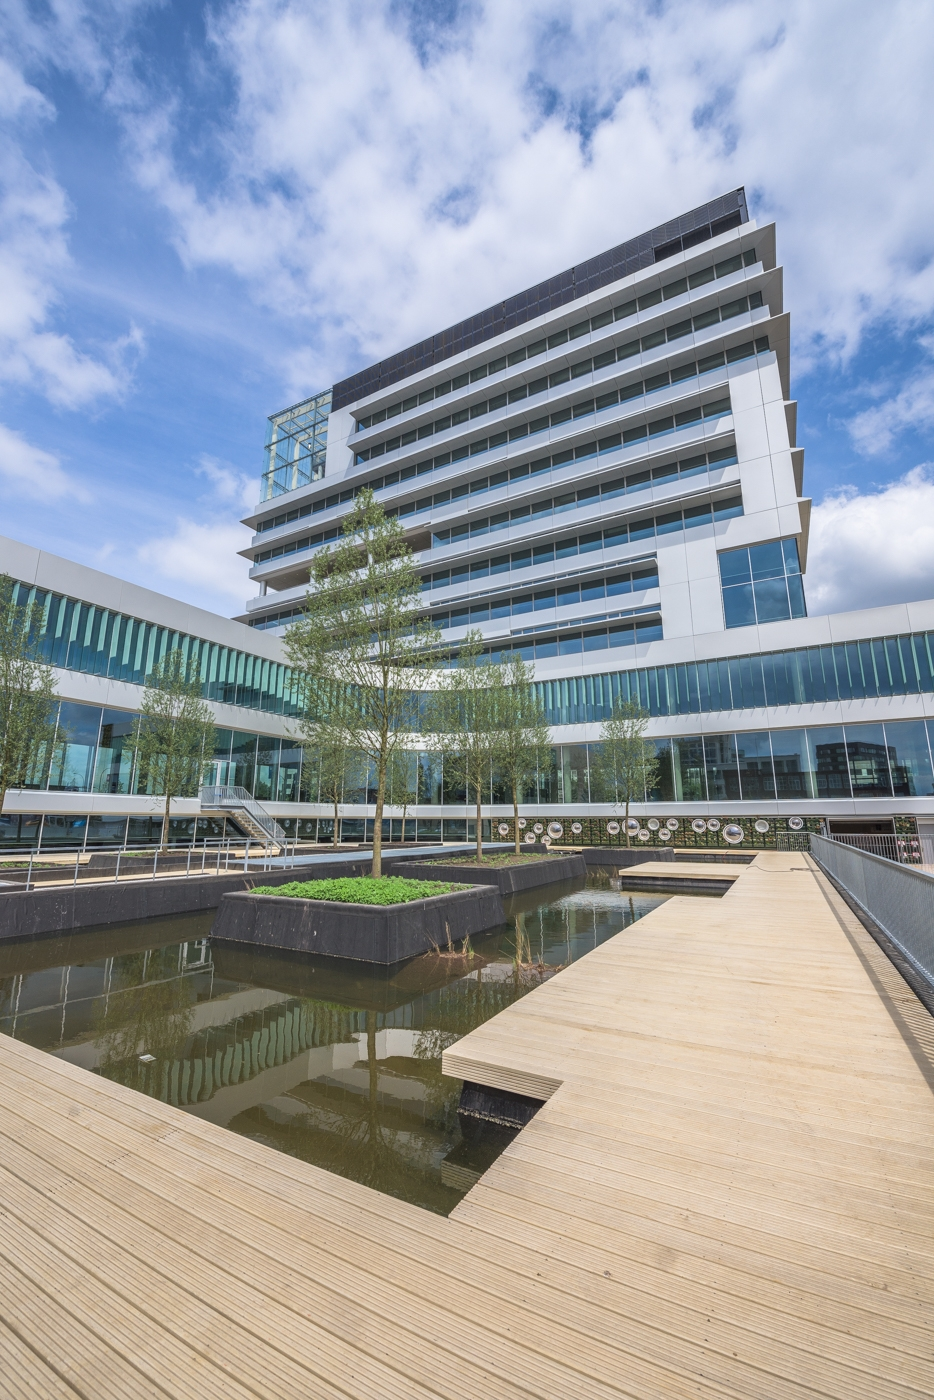 The municipality of Venlo organizes a C2C year